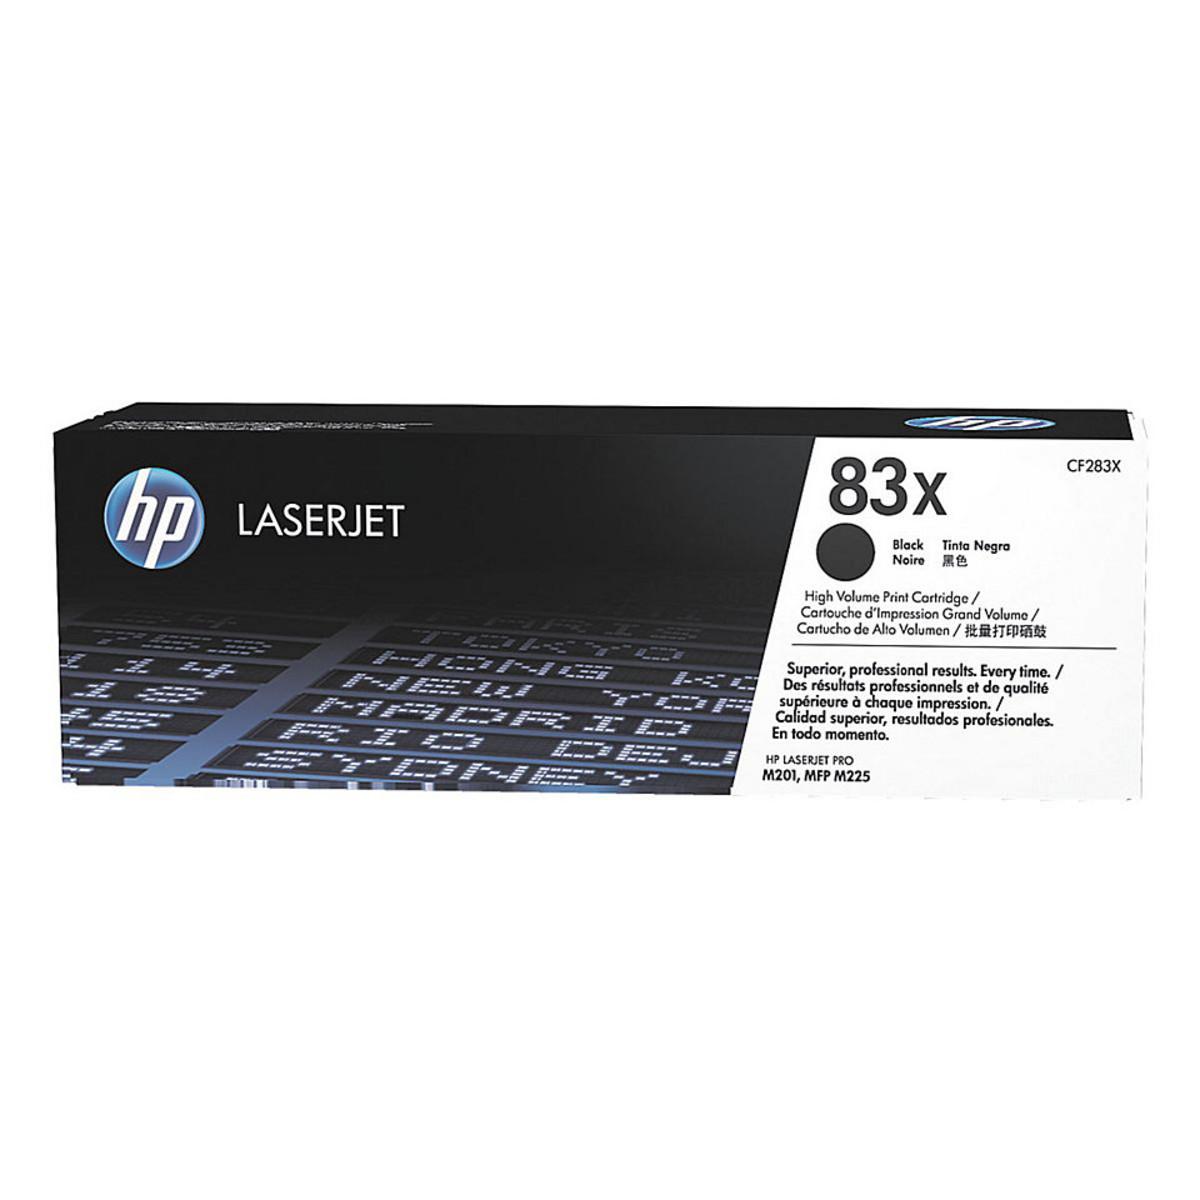 HP 83X (CF283X) Black Toner Cartridge - High Yield